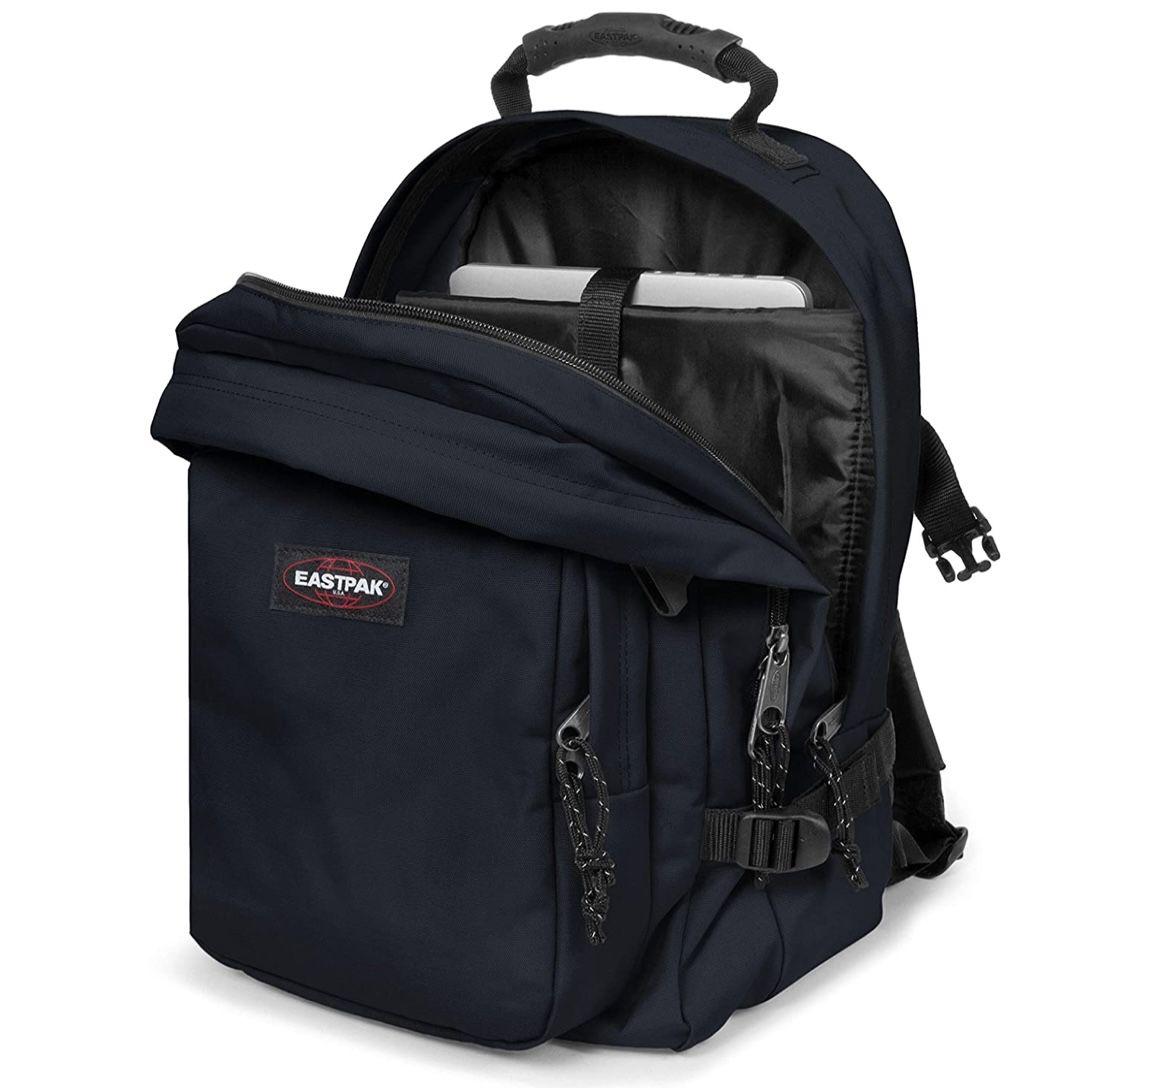 Eastpak Provider Rucksack 33 L in Blau für 48€ (statt 70€)